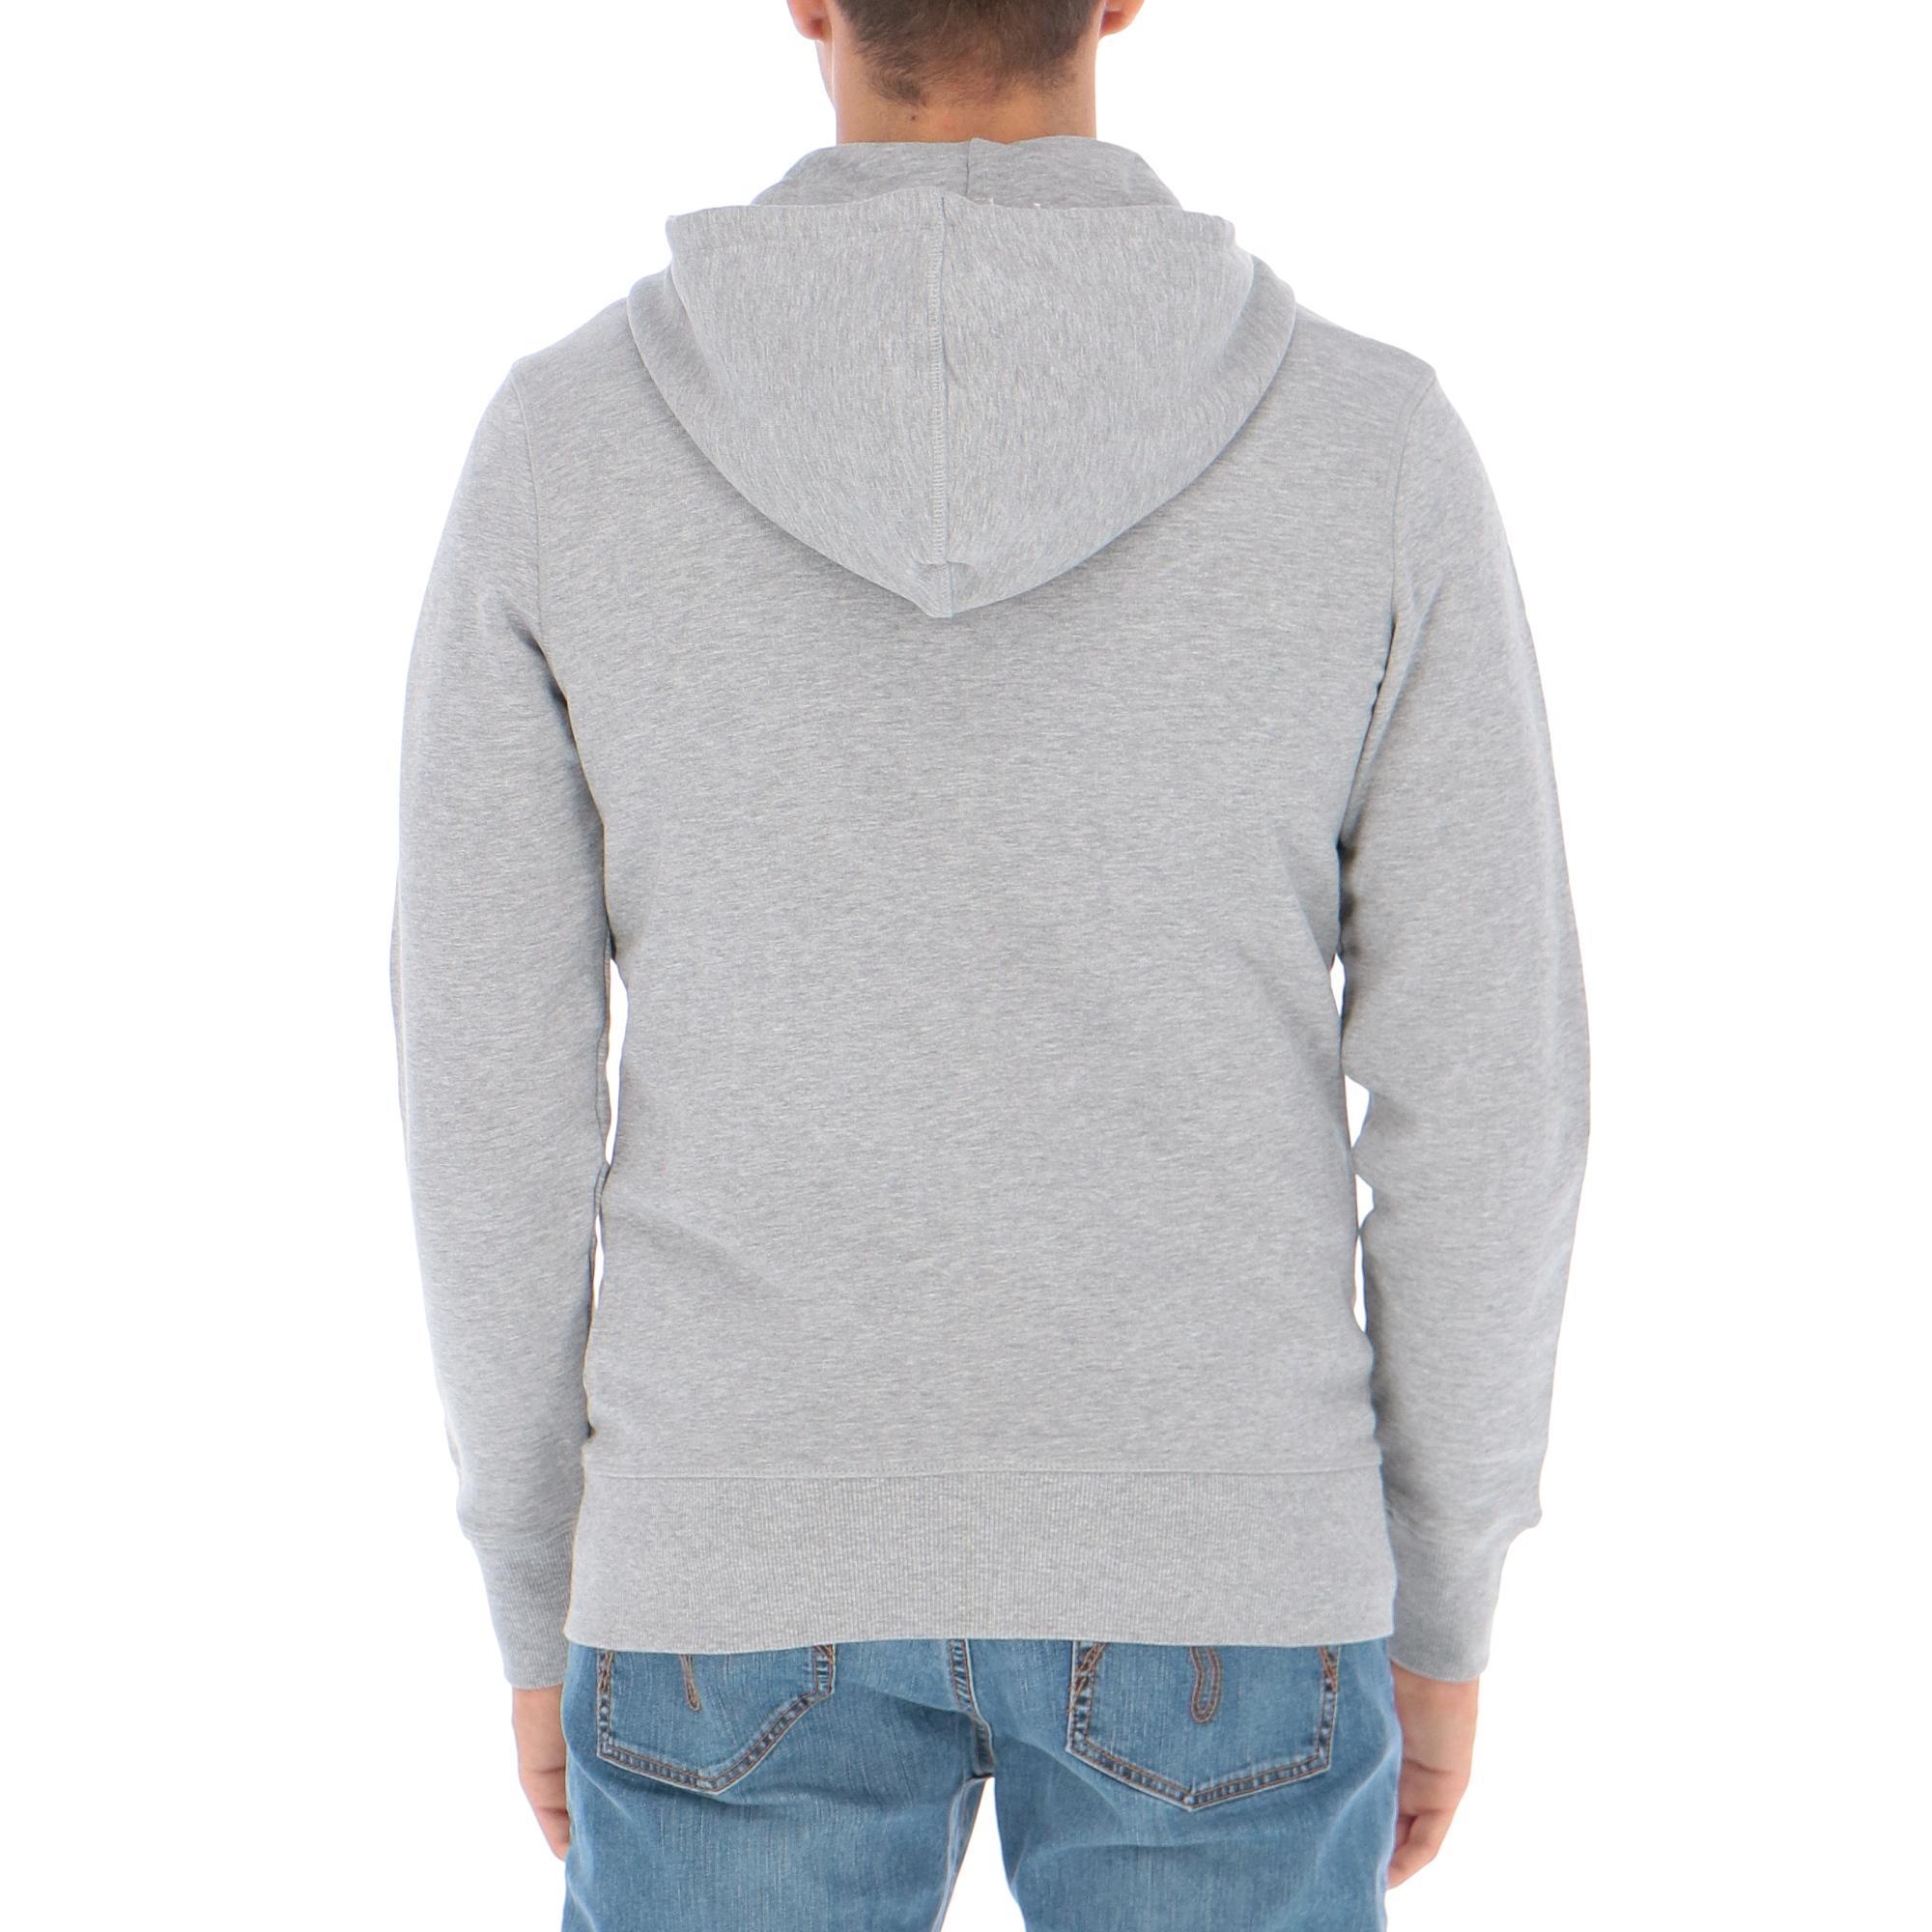 Hoodie Grey Middle 5palle Light Zip Diadora Melange 8Twq7q